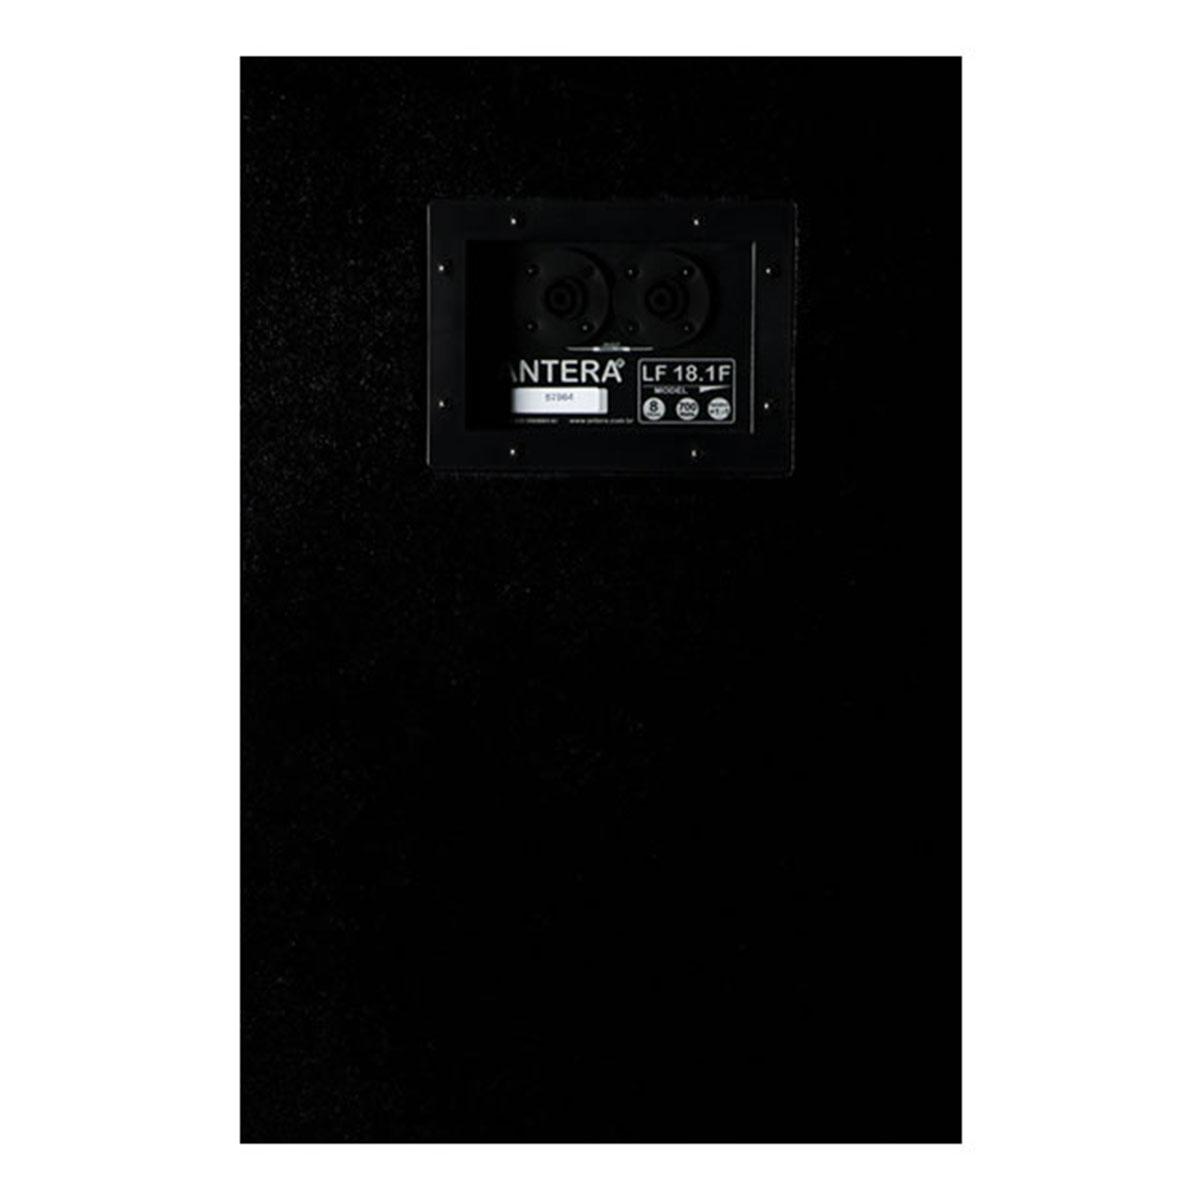 Subwoofer Passivo Fal 18 Pol 700W - LF 18.1 Antera